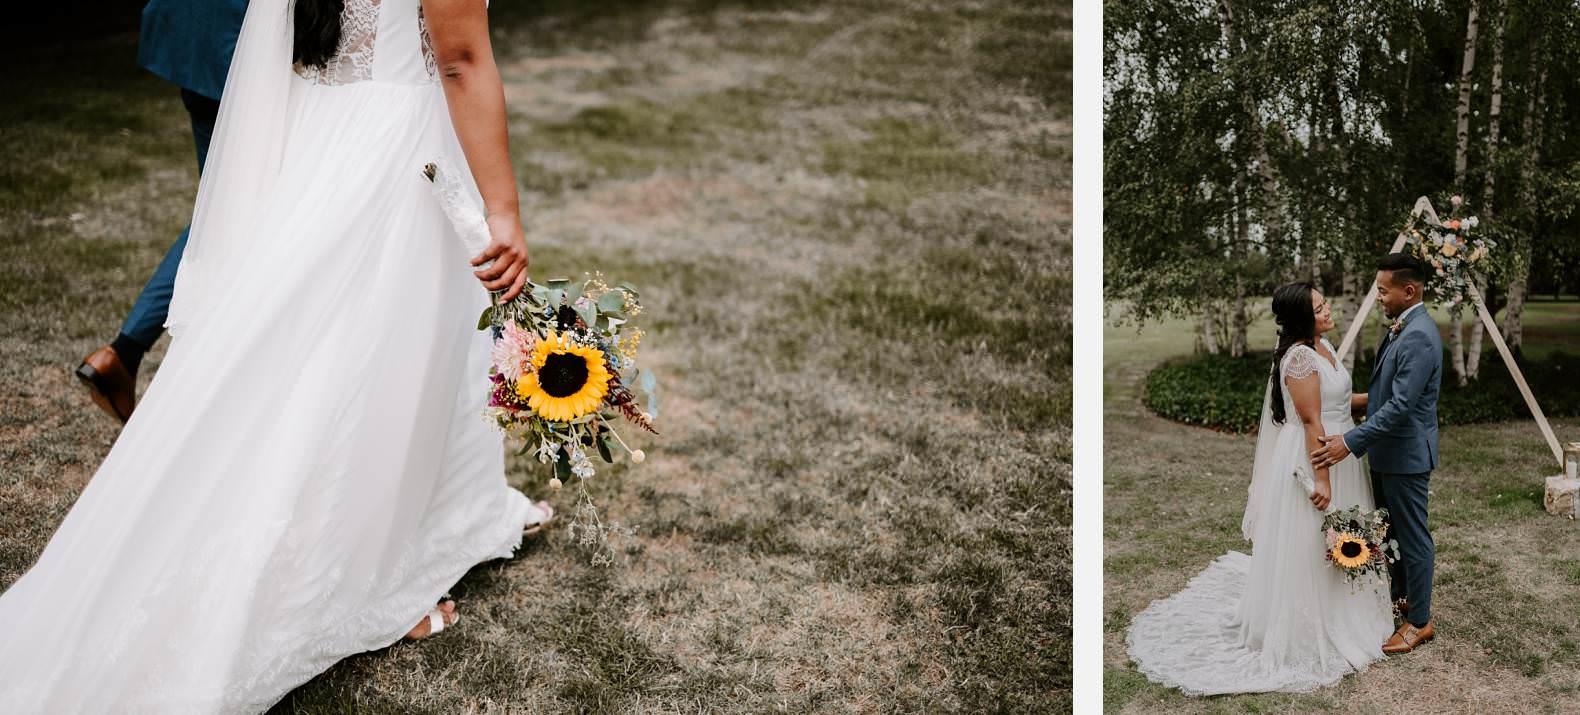 mariage manoir de corny photographe bel esprit 0054 1